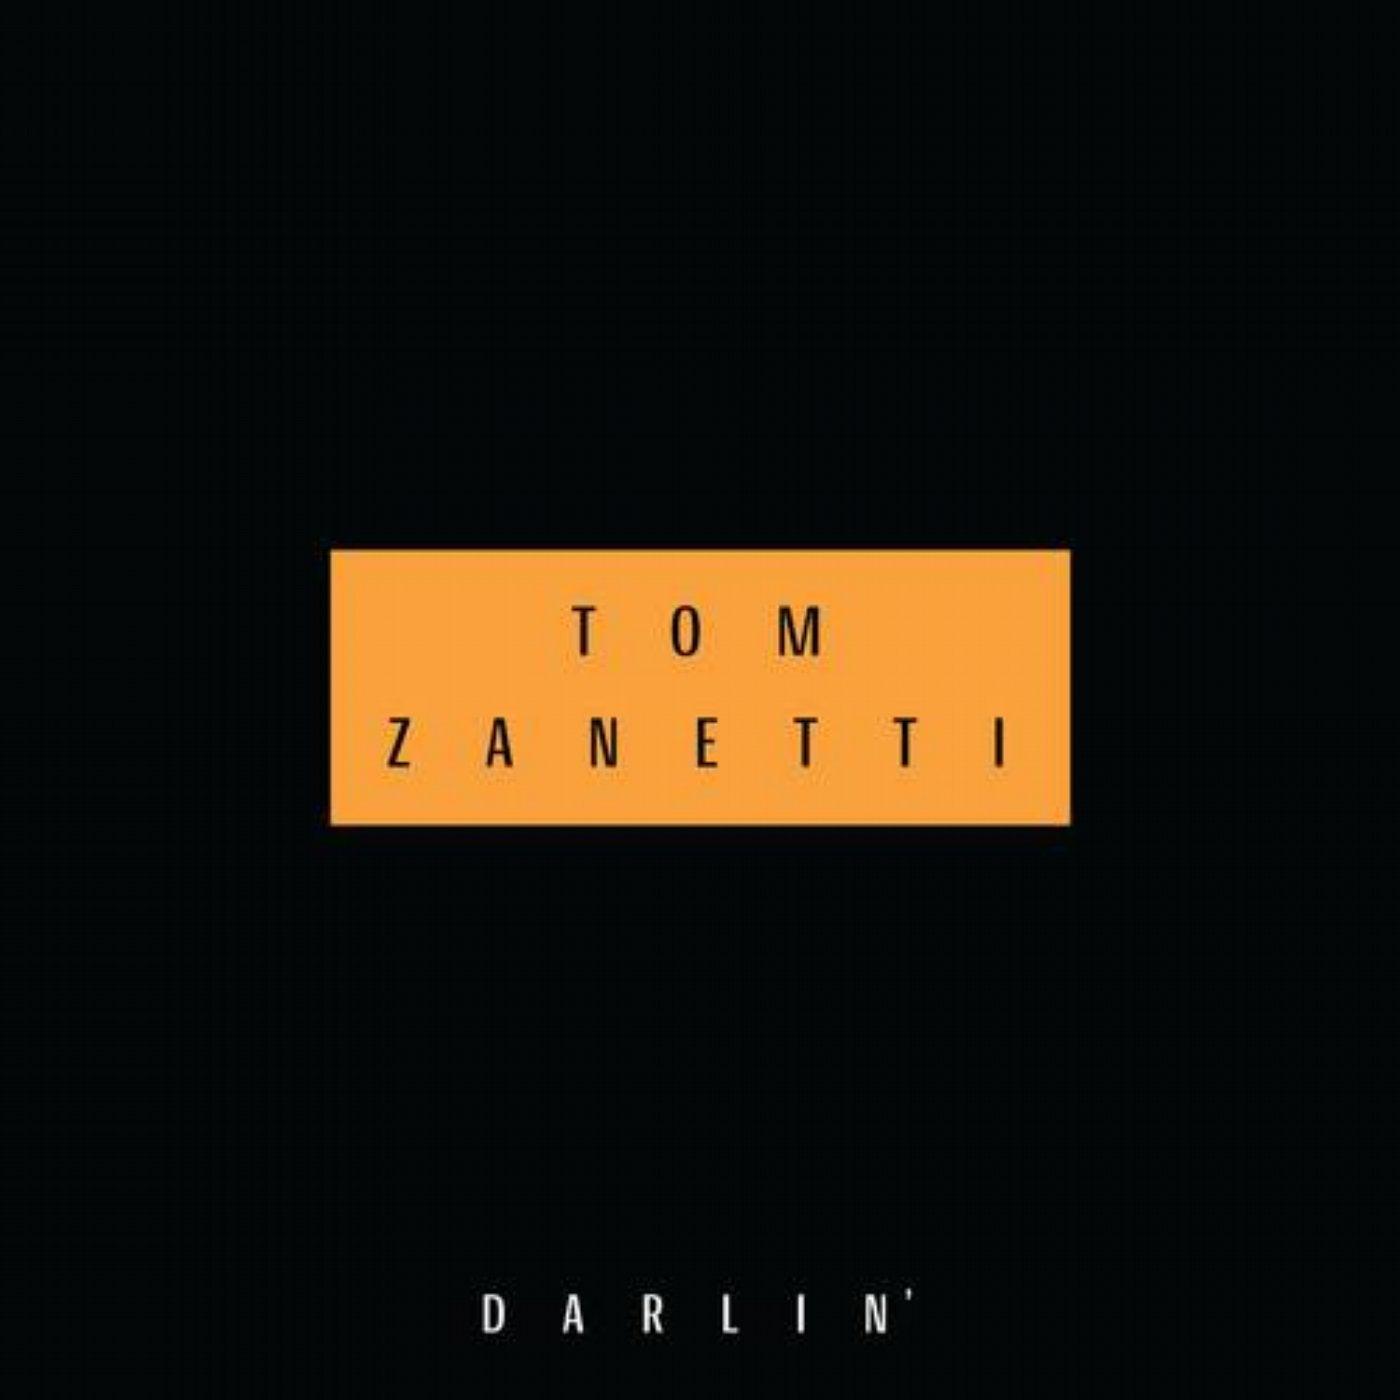 Darlin' (Original Mix)